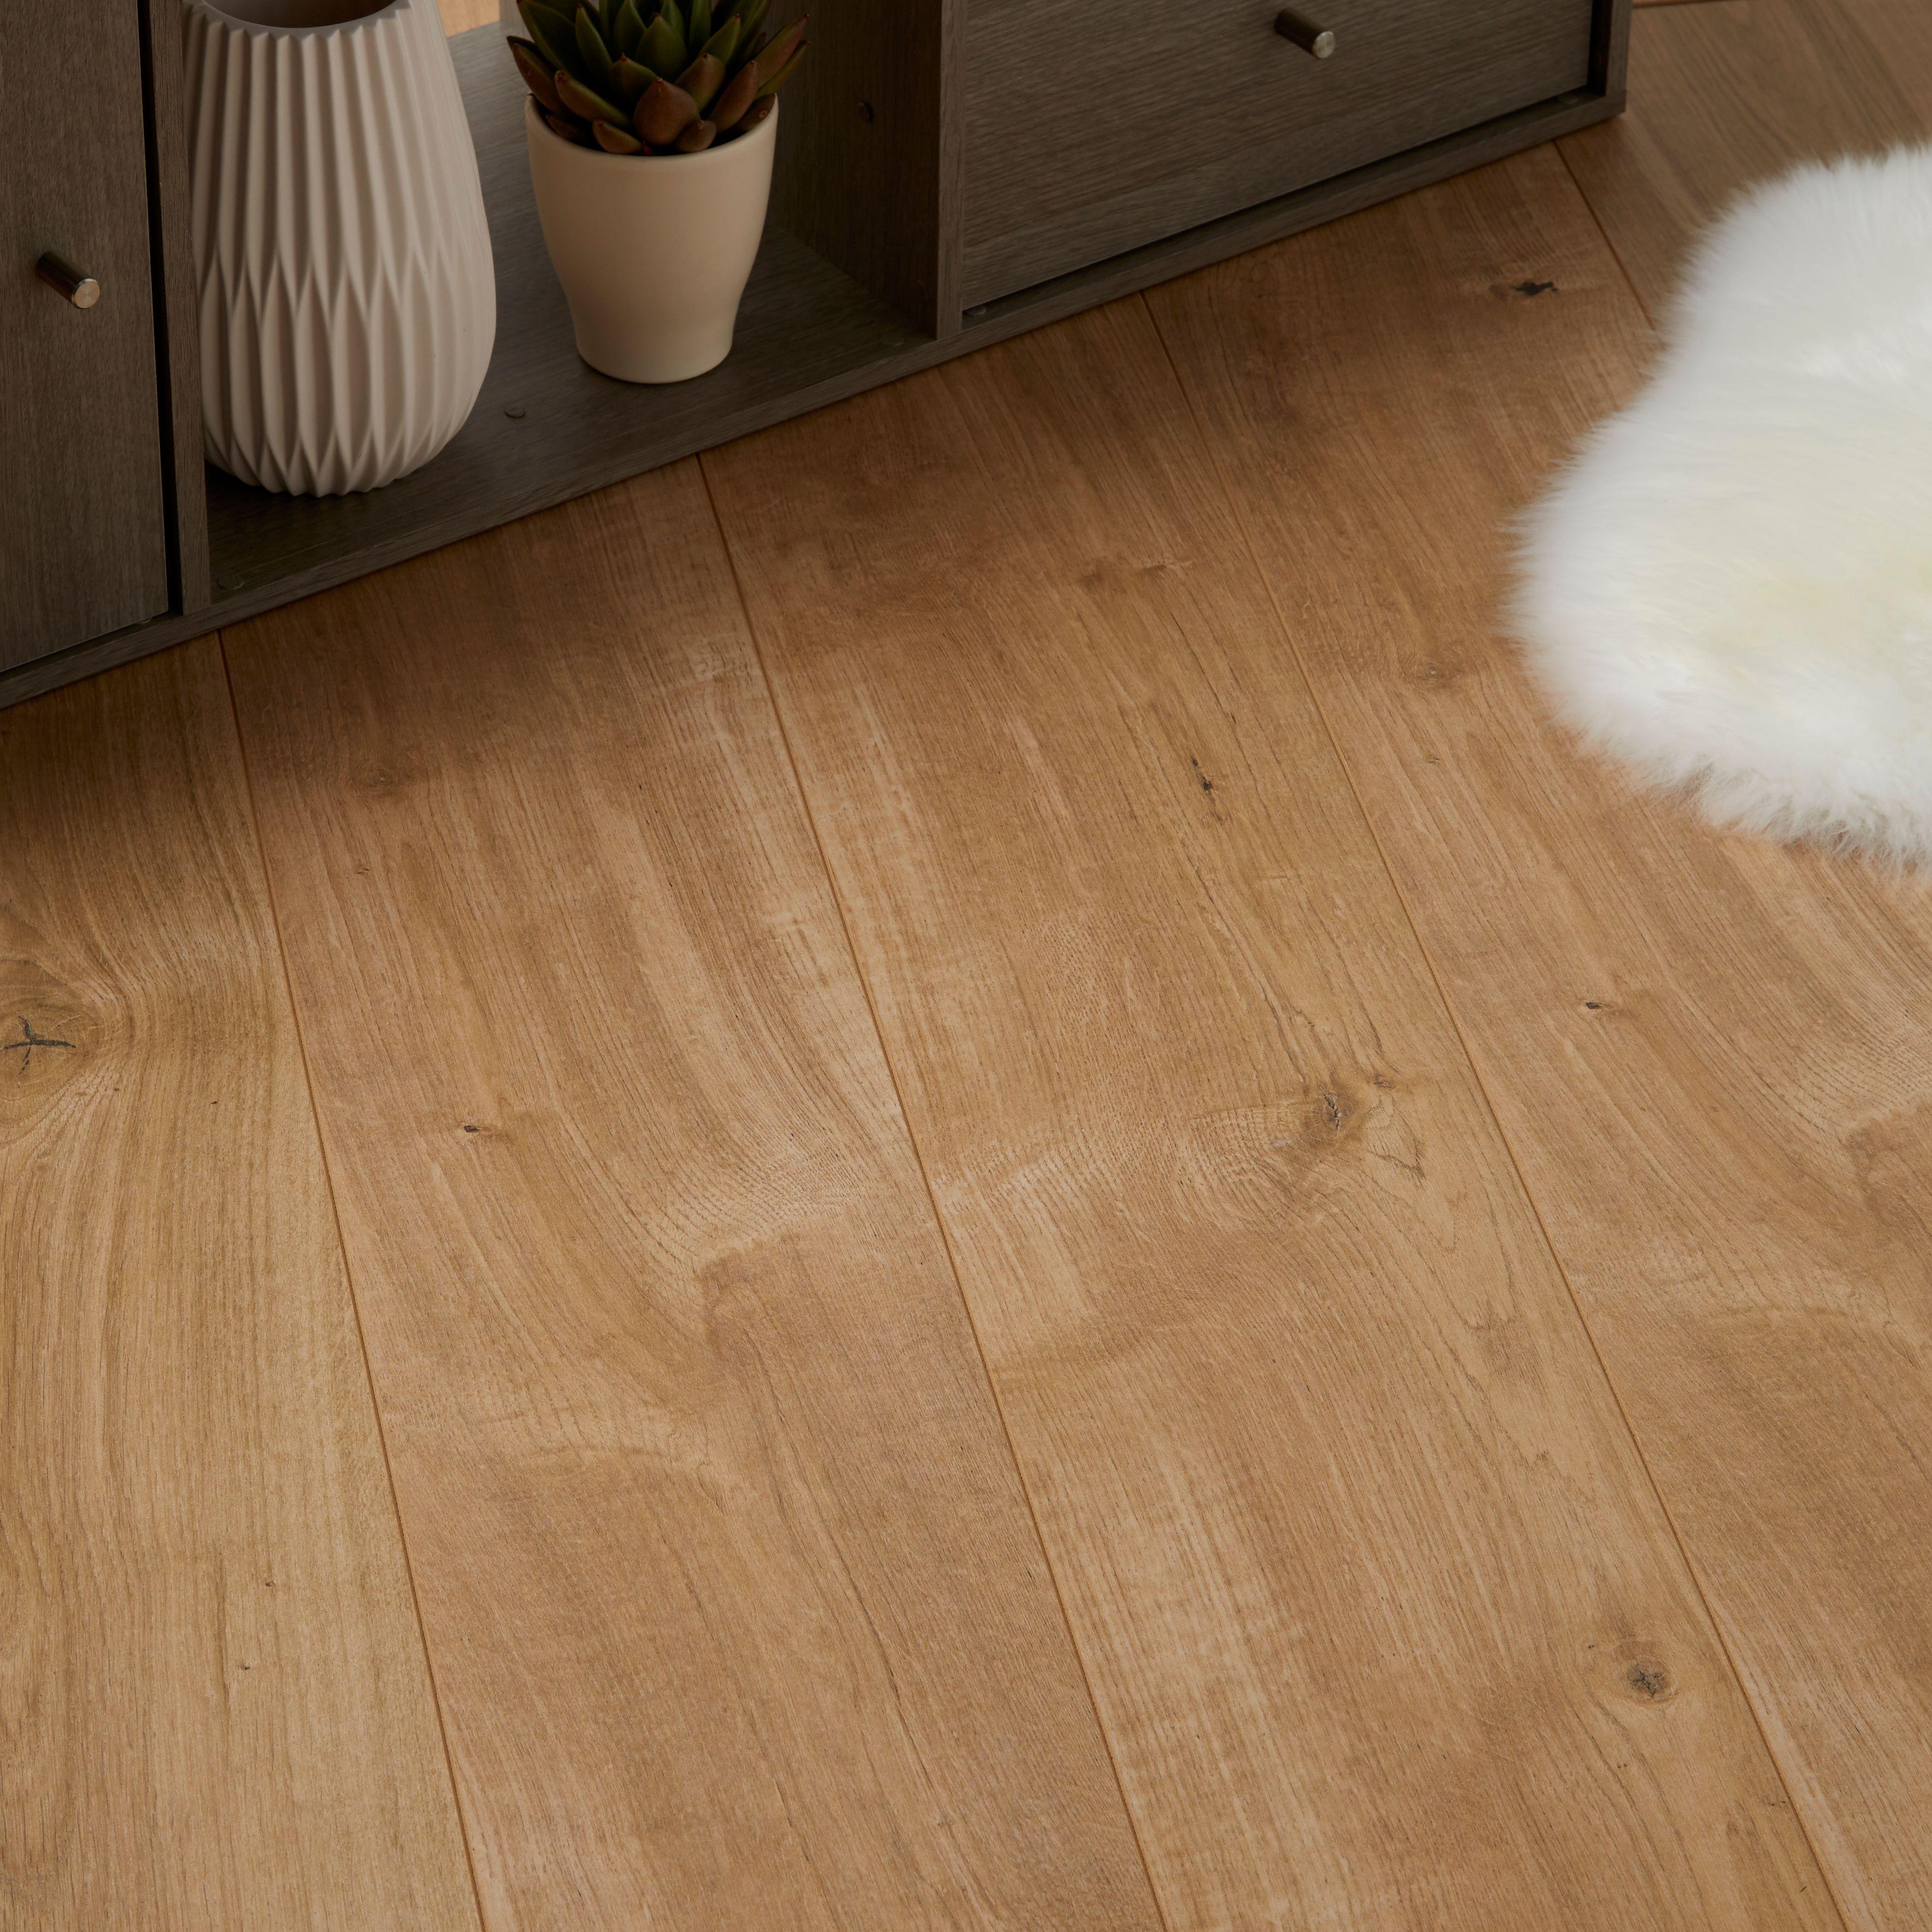 Gladstone Natural Oak Effect Laminate Flooring 1 996 M² Pack